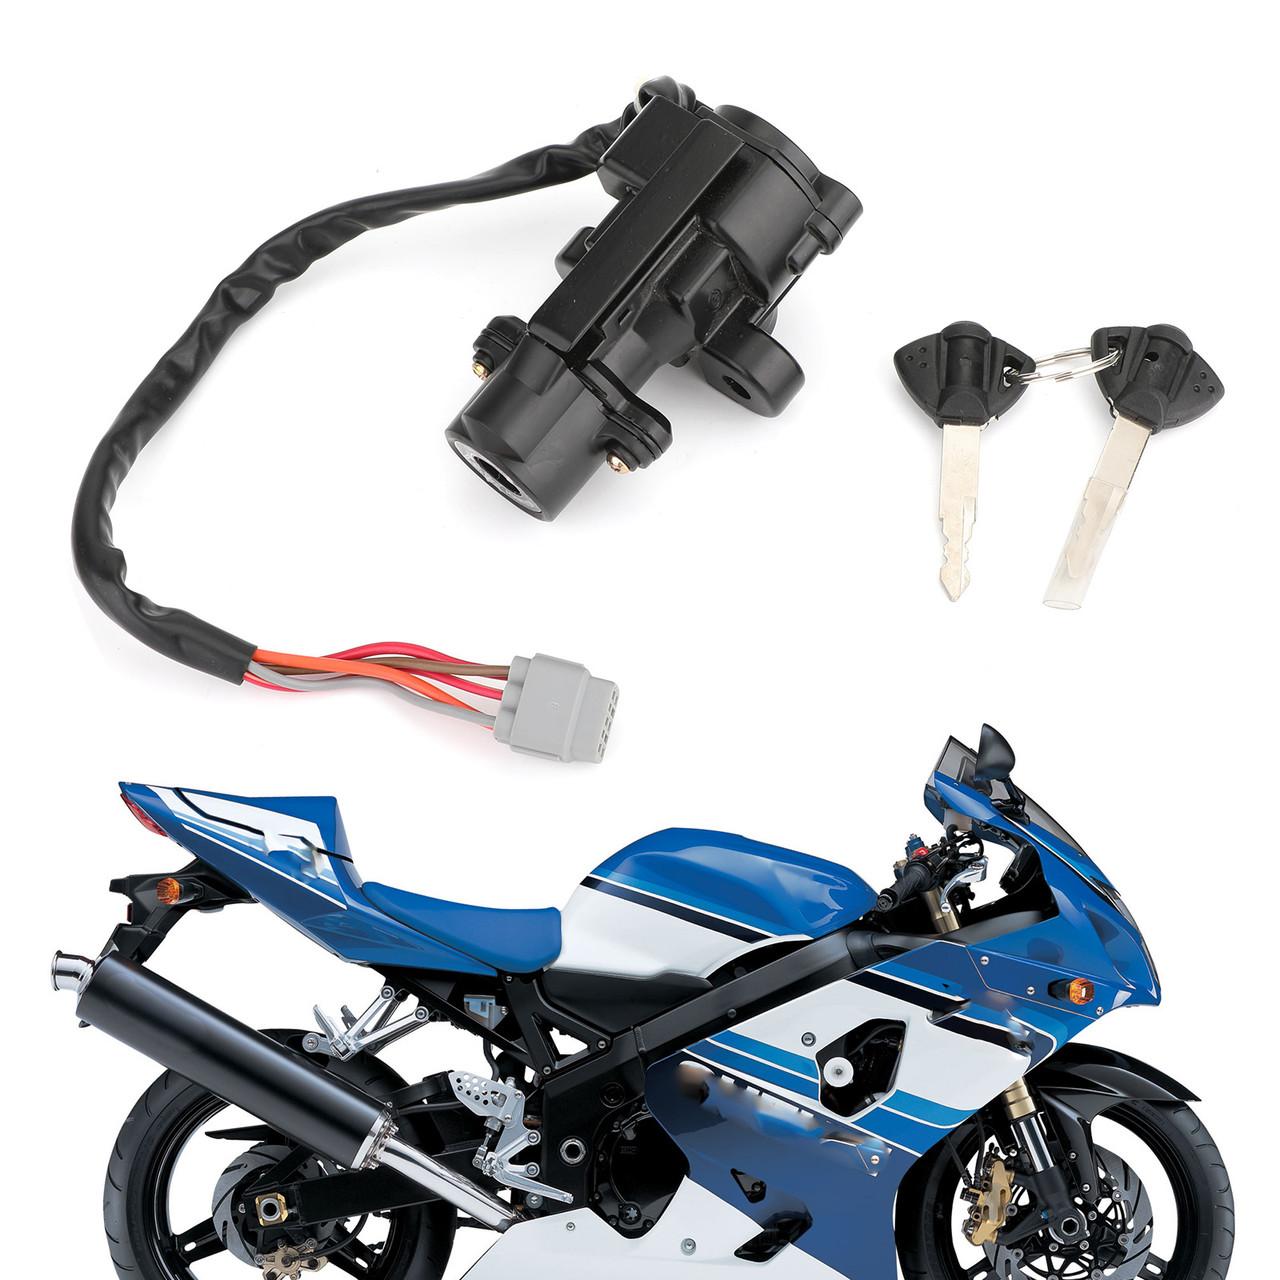 Ignition Switch Lock Keys Kit Fit for Fit for Suzuki GSXR600 GSXR750 06-18 GSXR1000 05-18